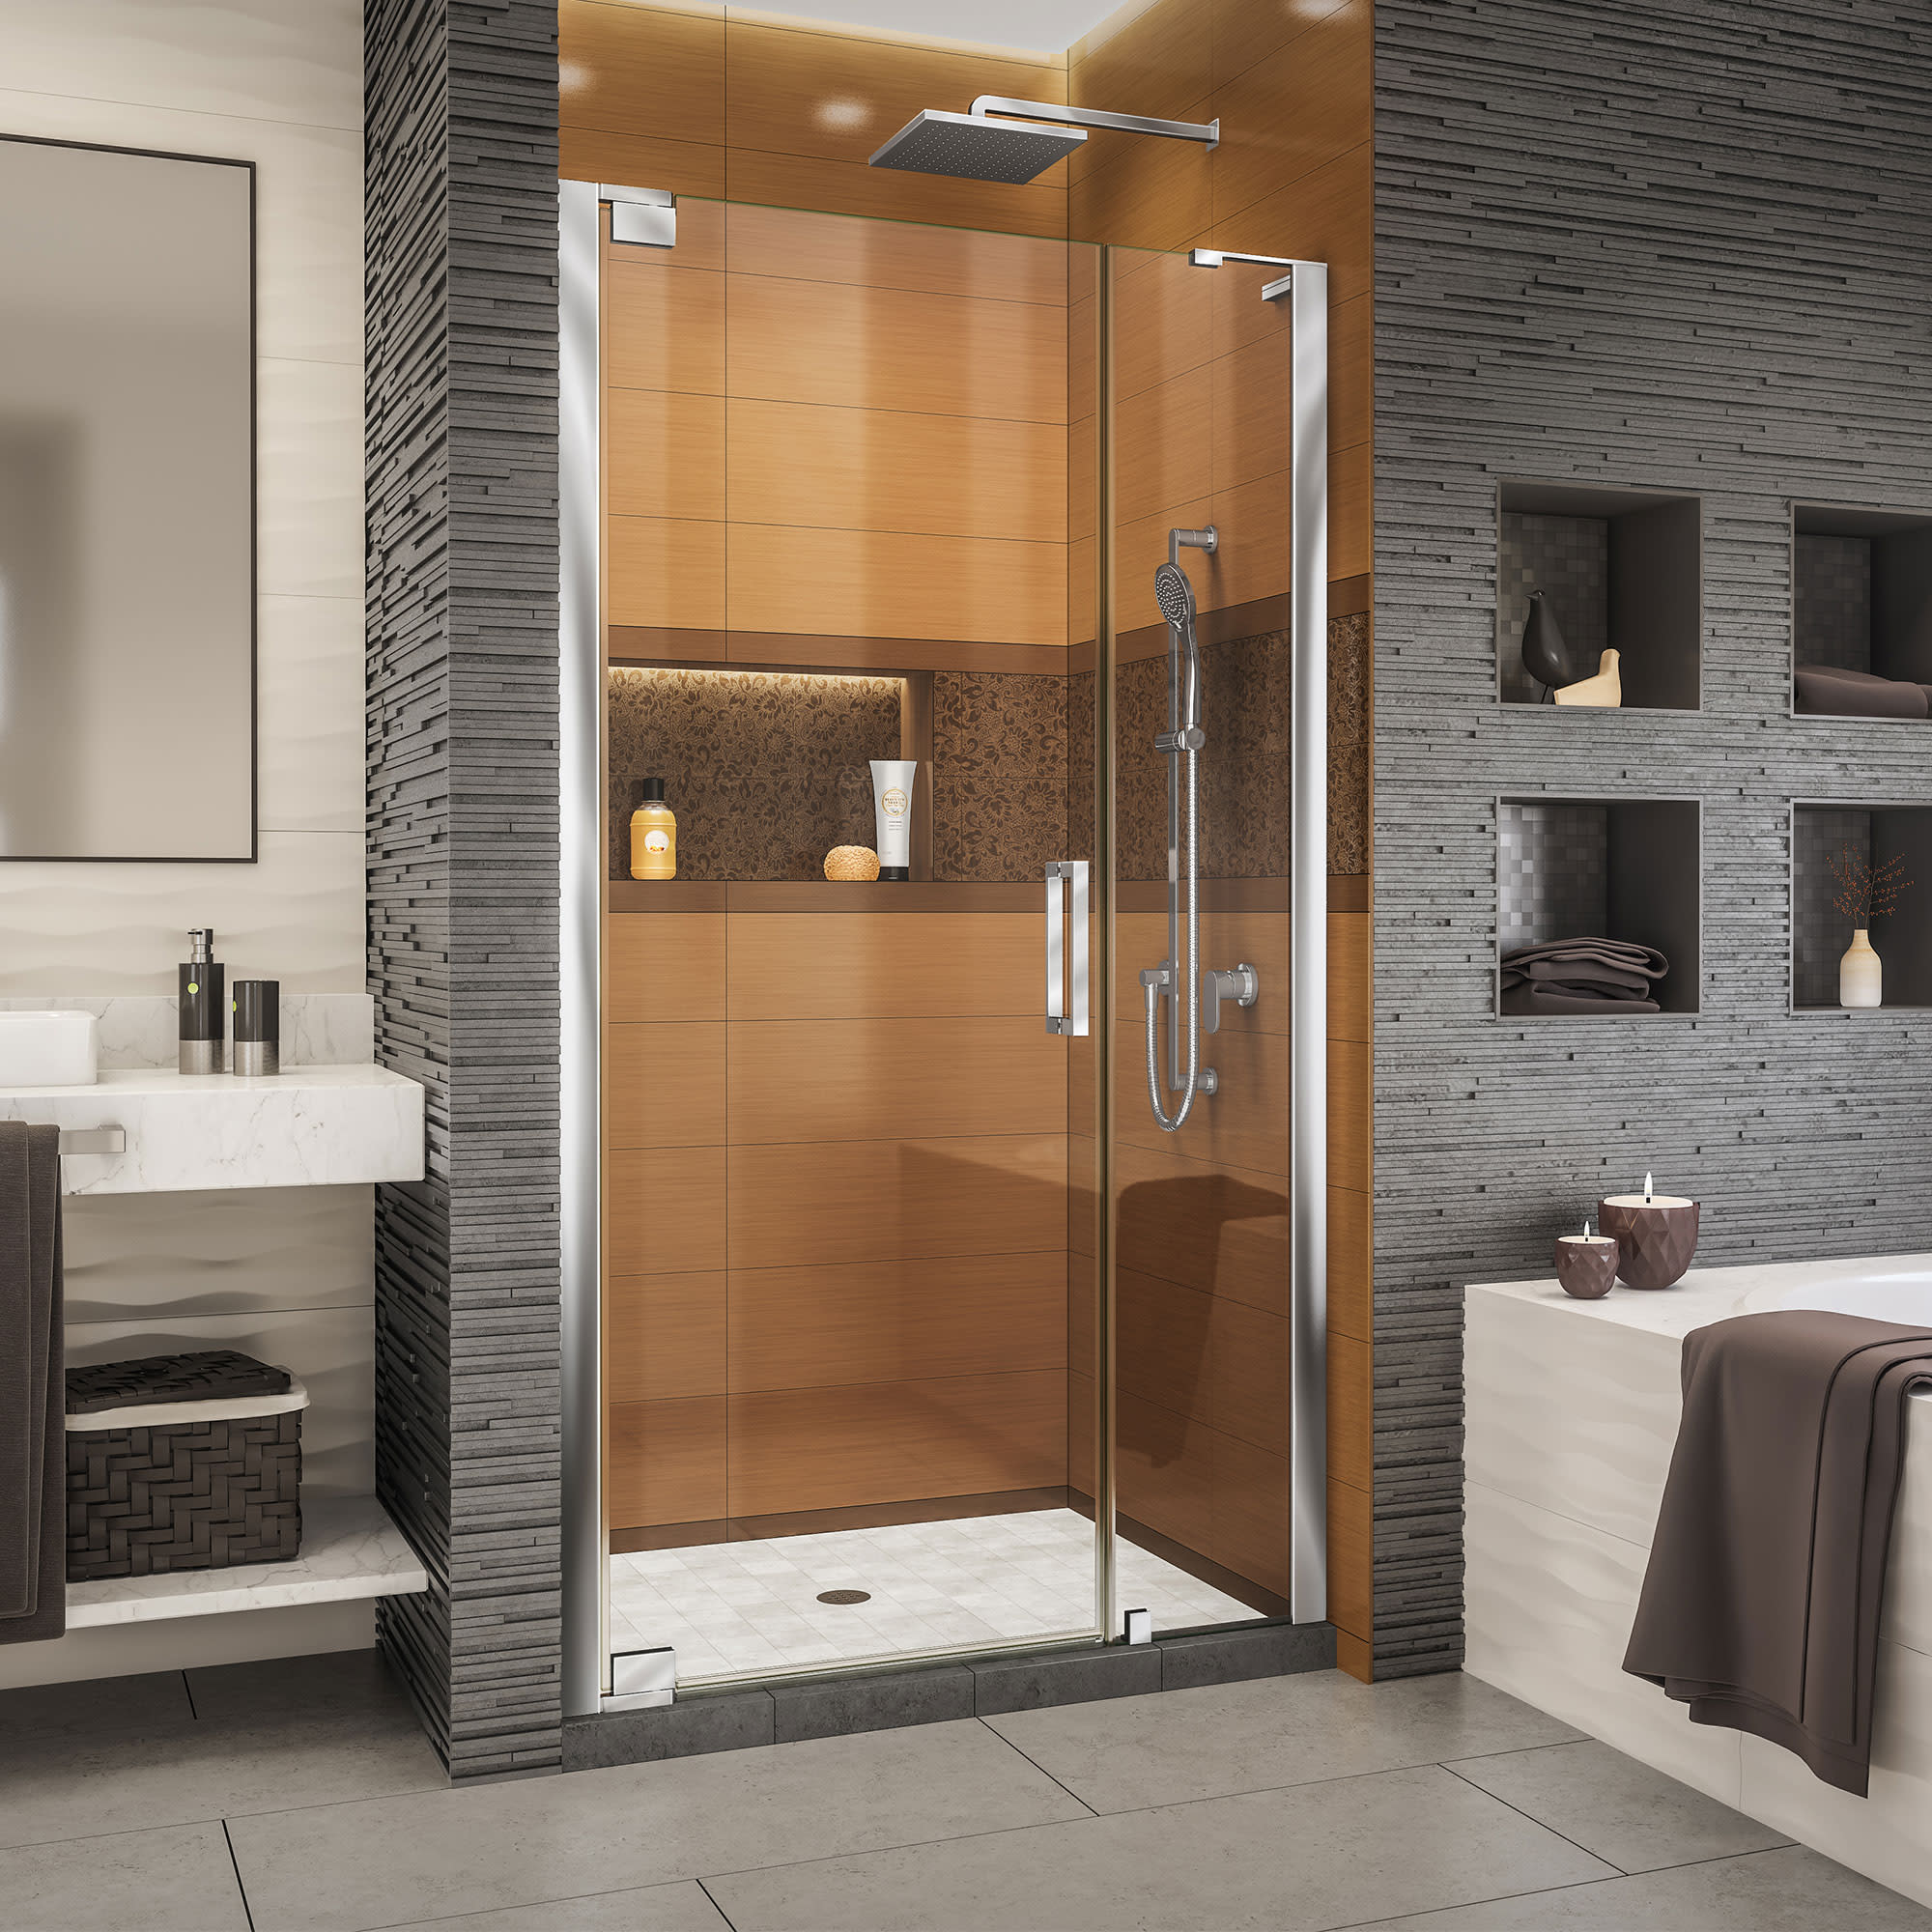 Dreamline SHDR-4335120 Elegance-ls Shower Door | QualityBath.com